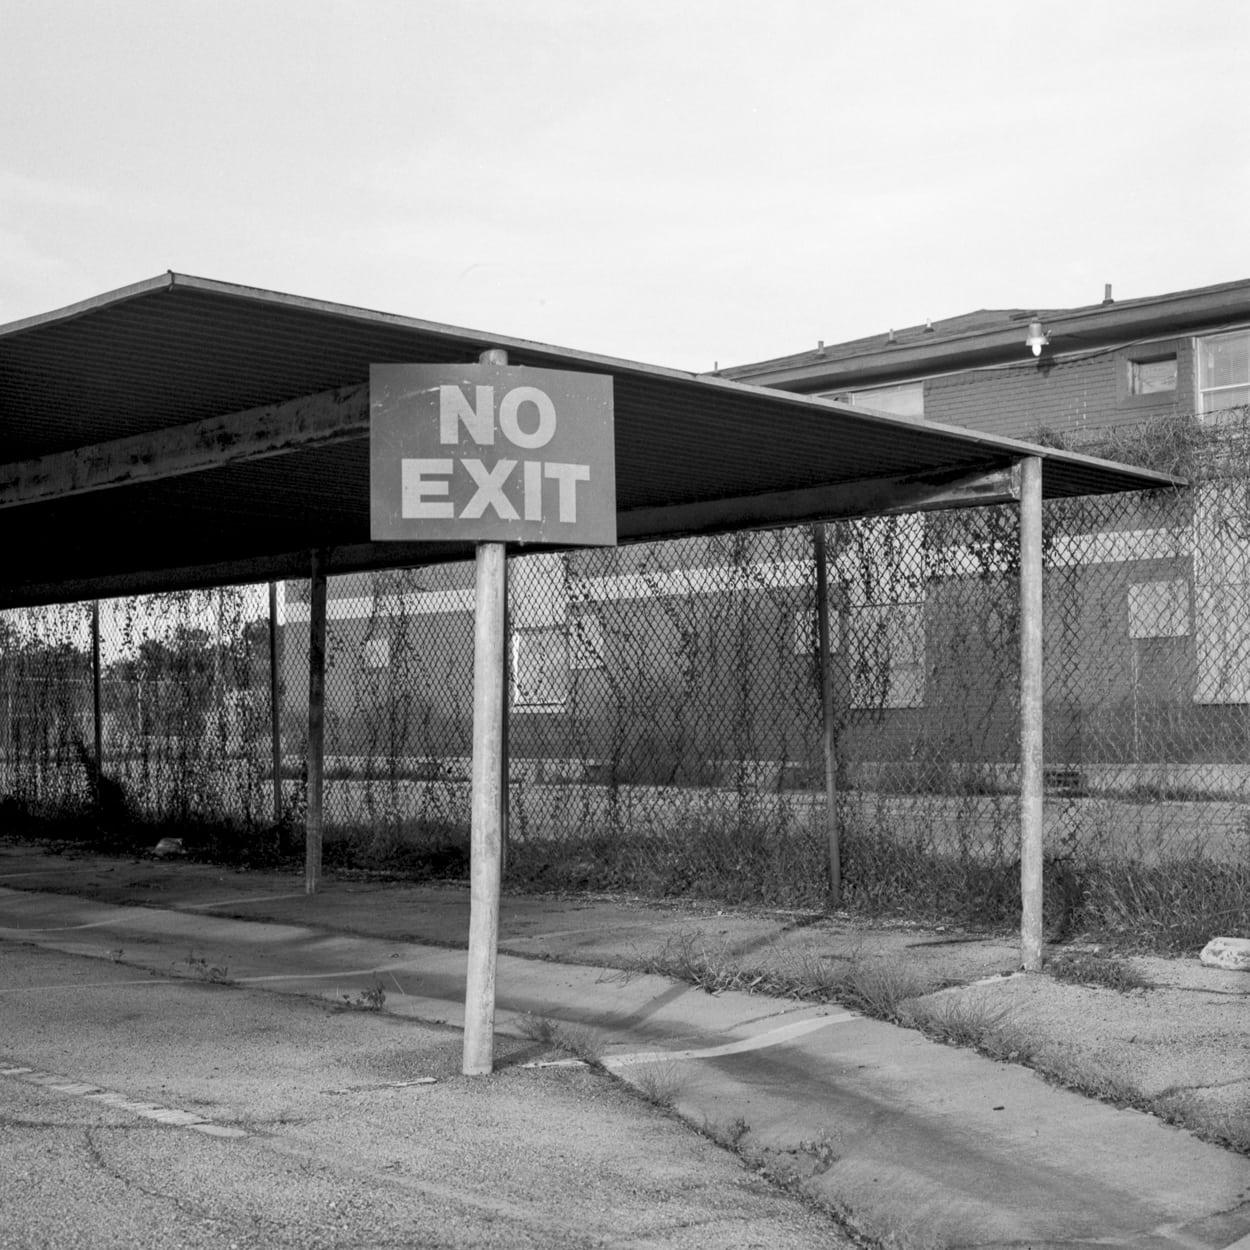 A no exit parking lot sign